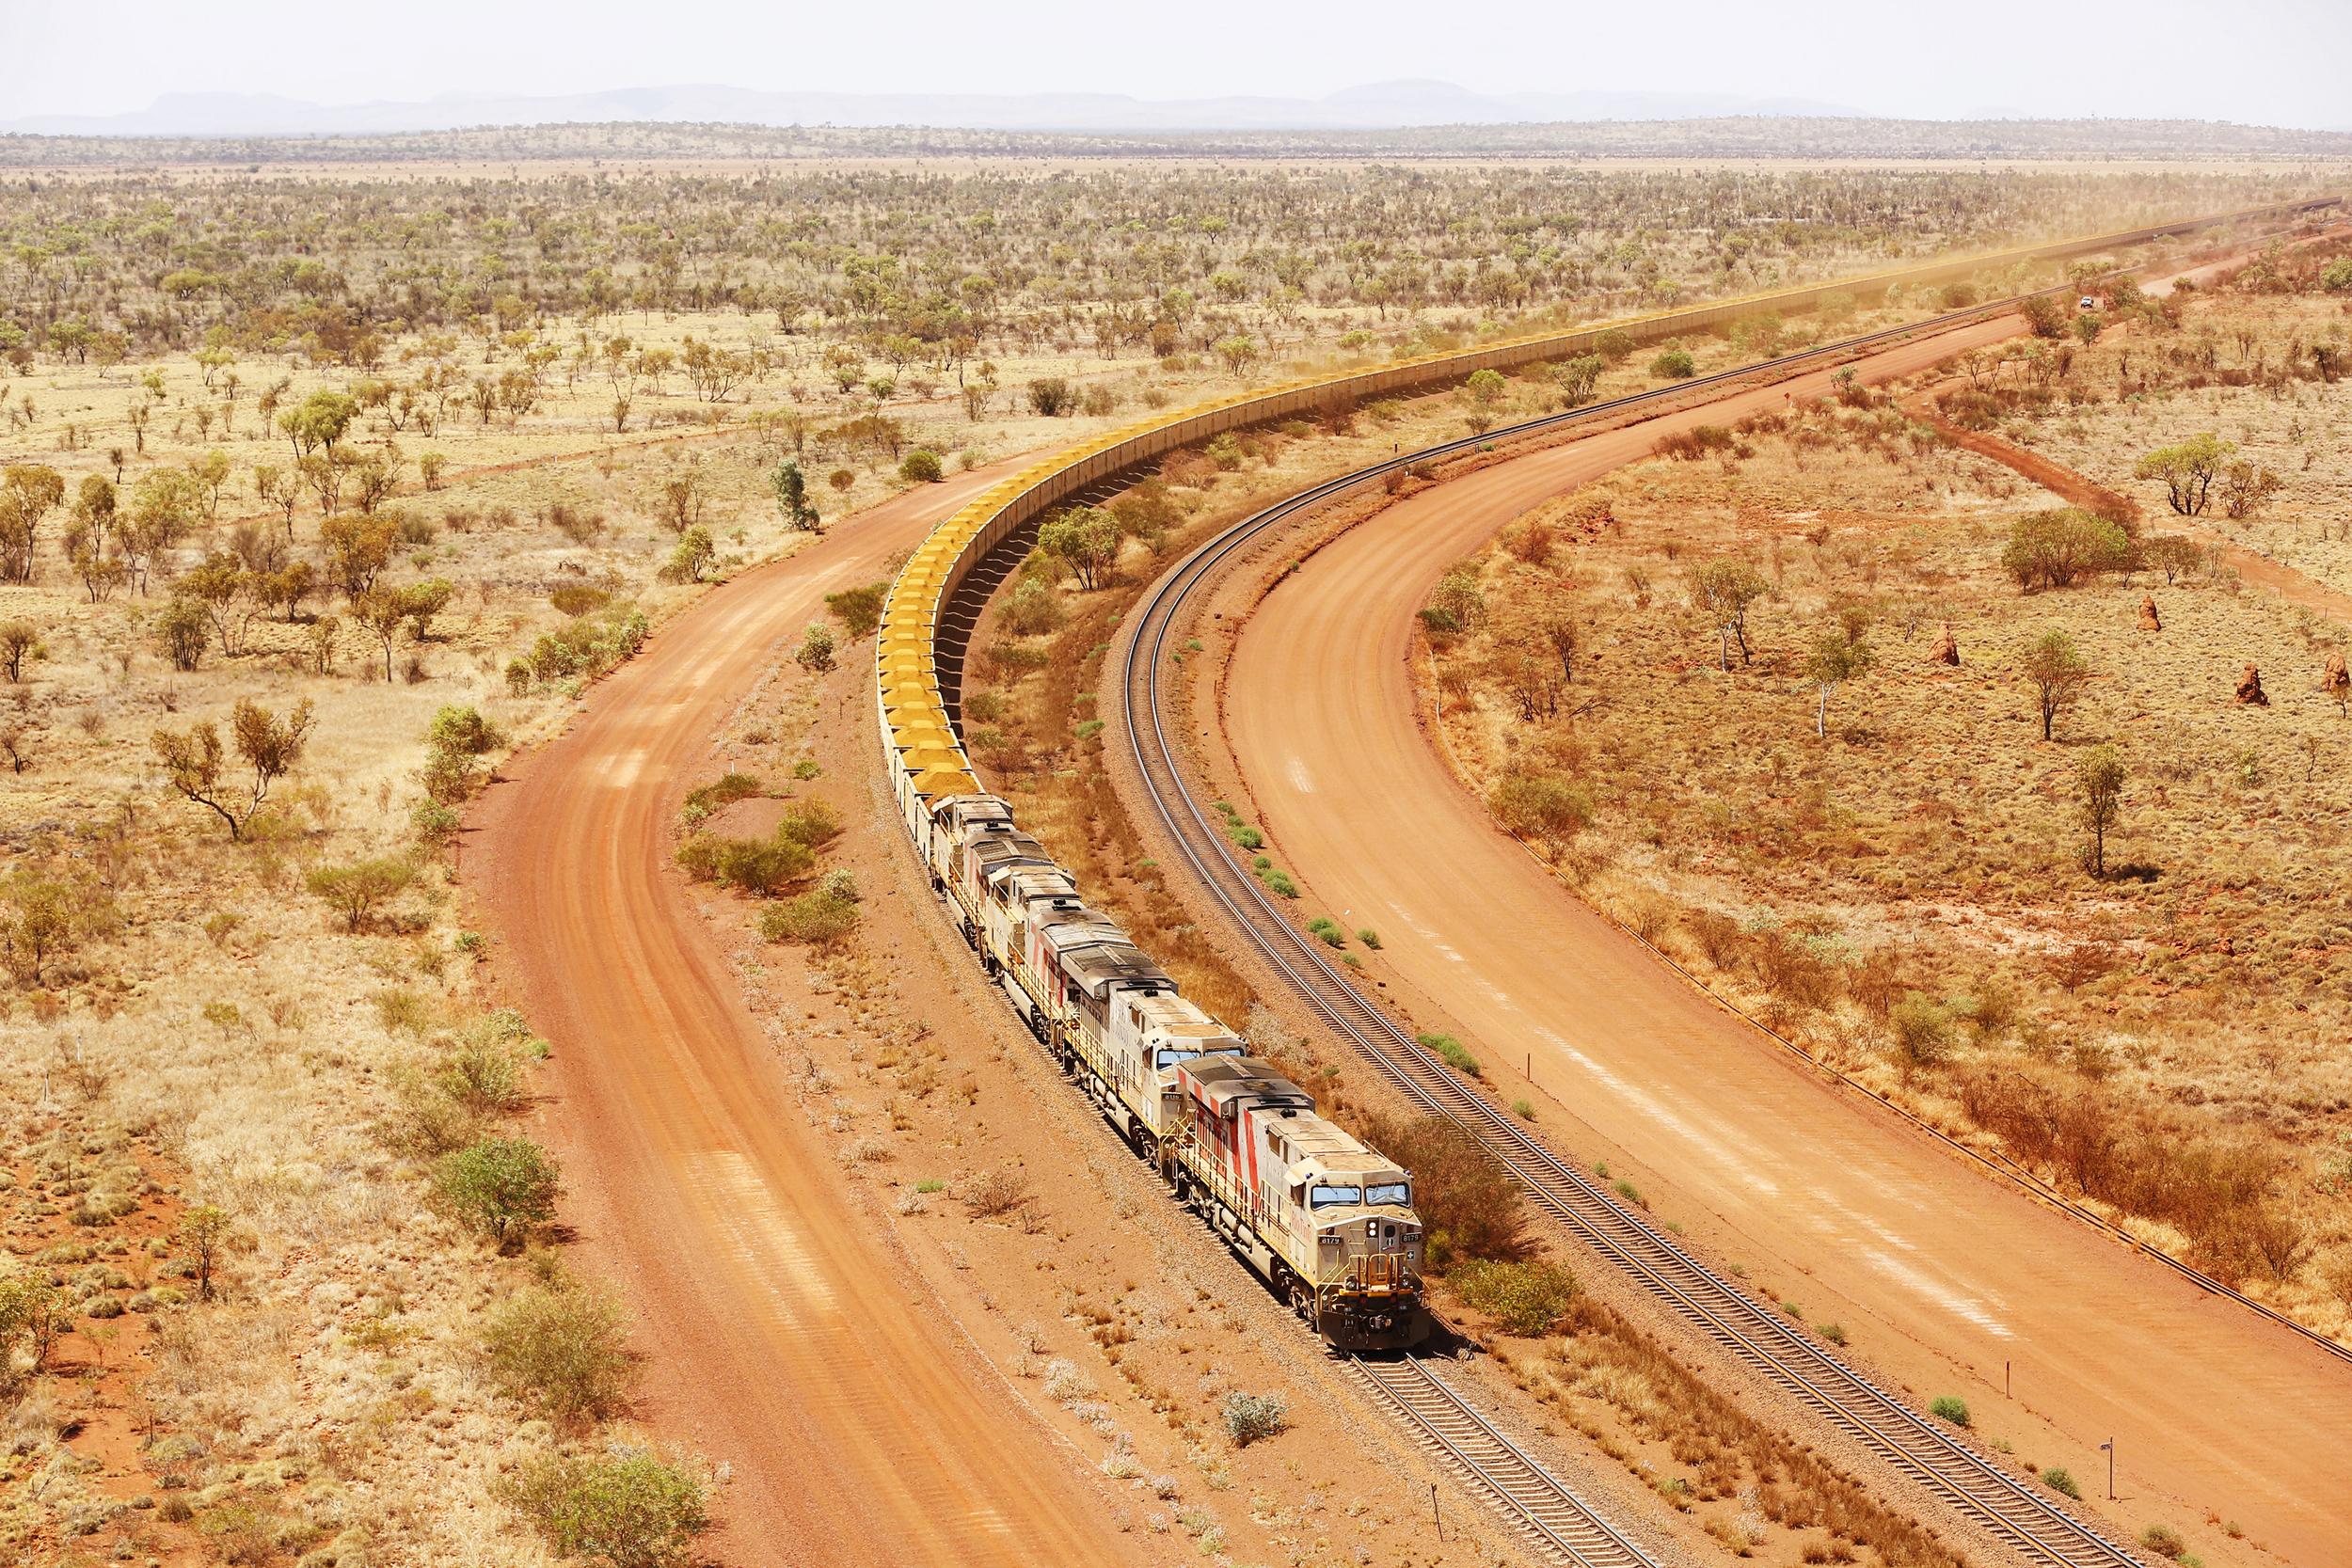 Iron Ore Train, Hamersley Station, Pilbara, Western Australia, 2016. Edition of 3.